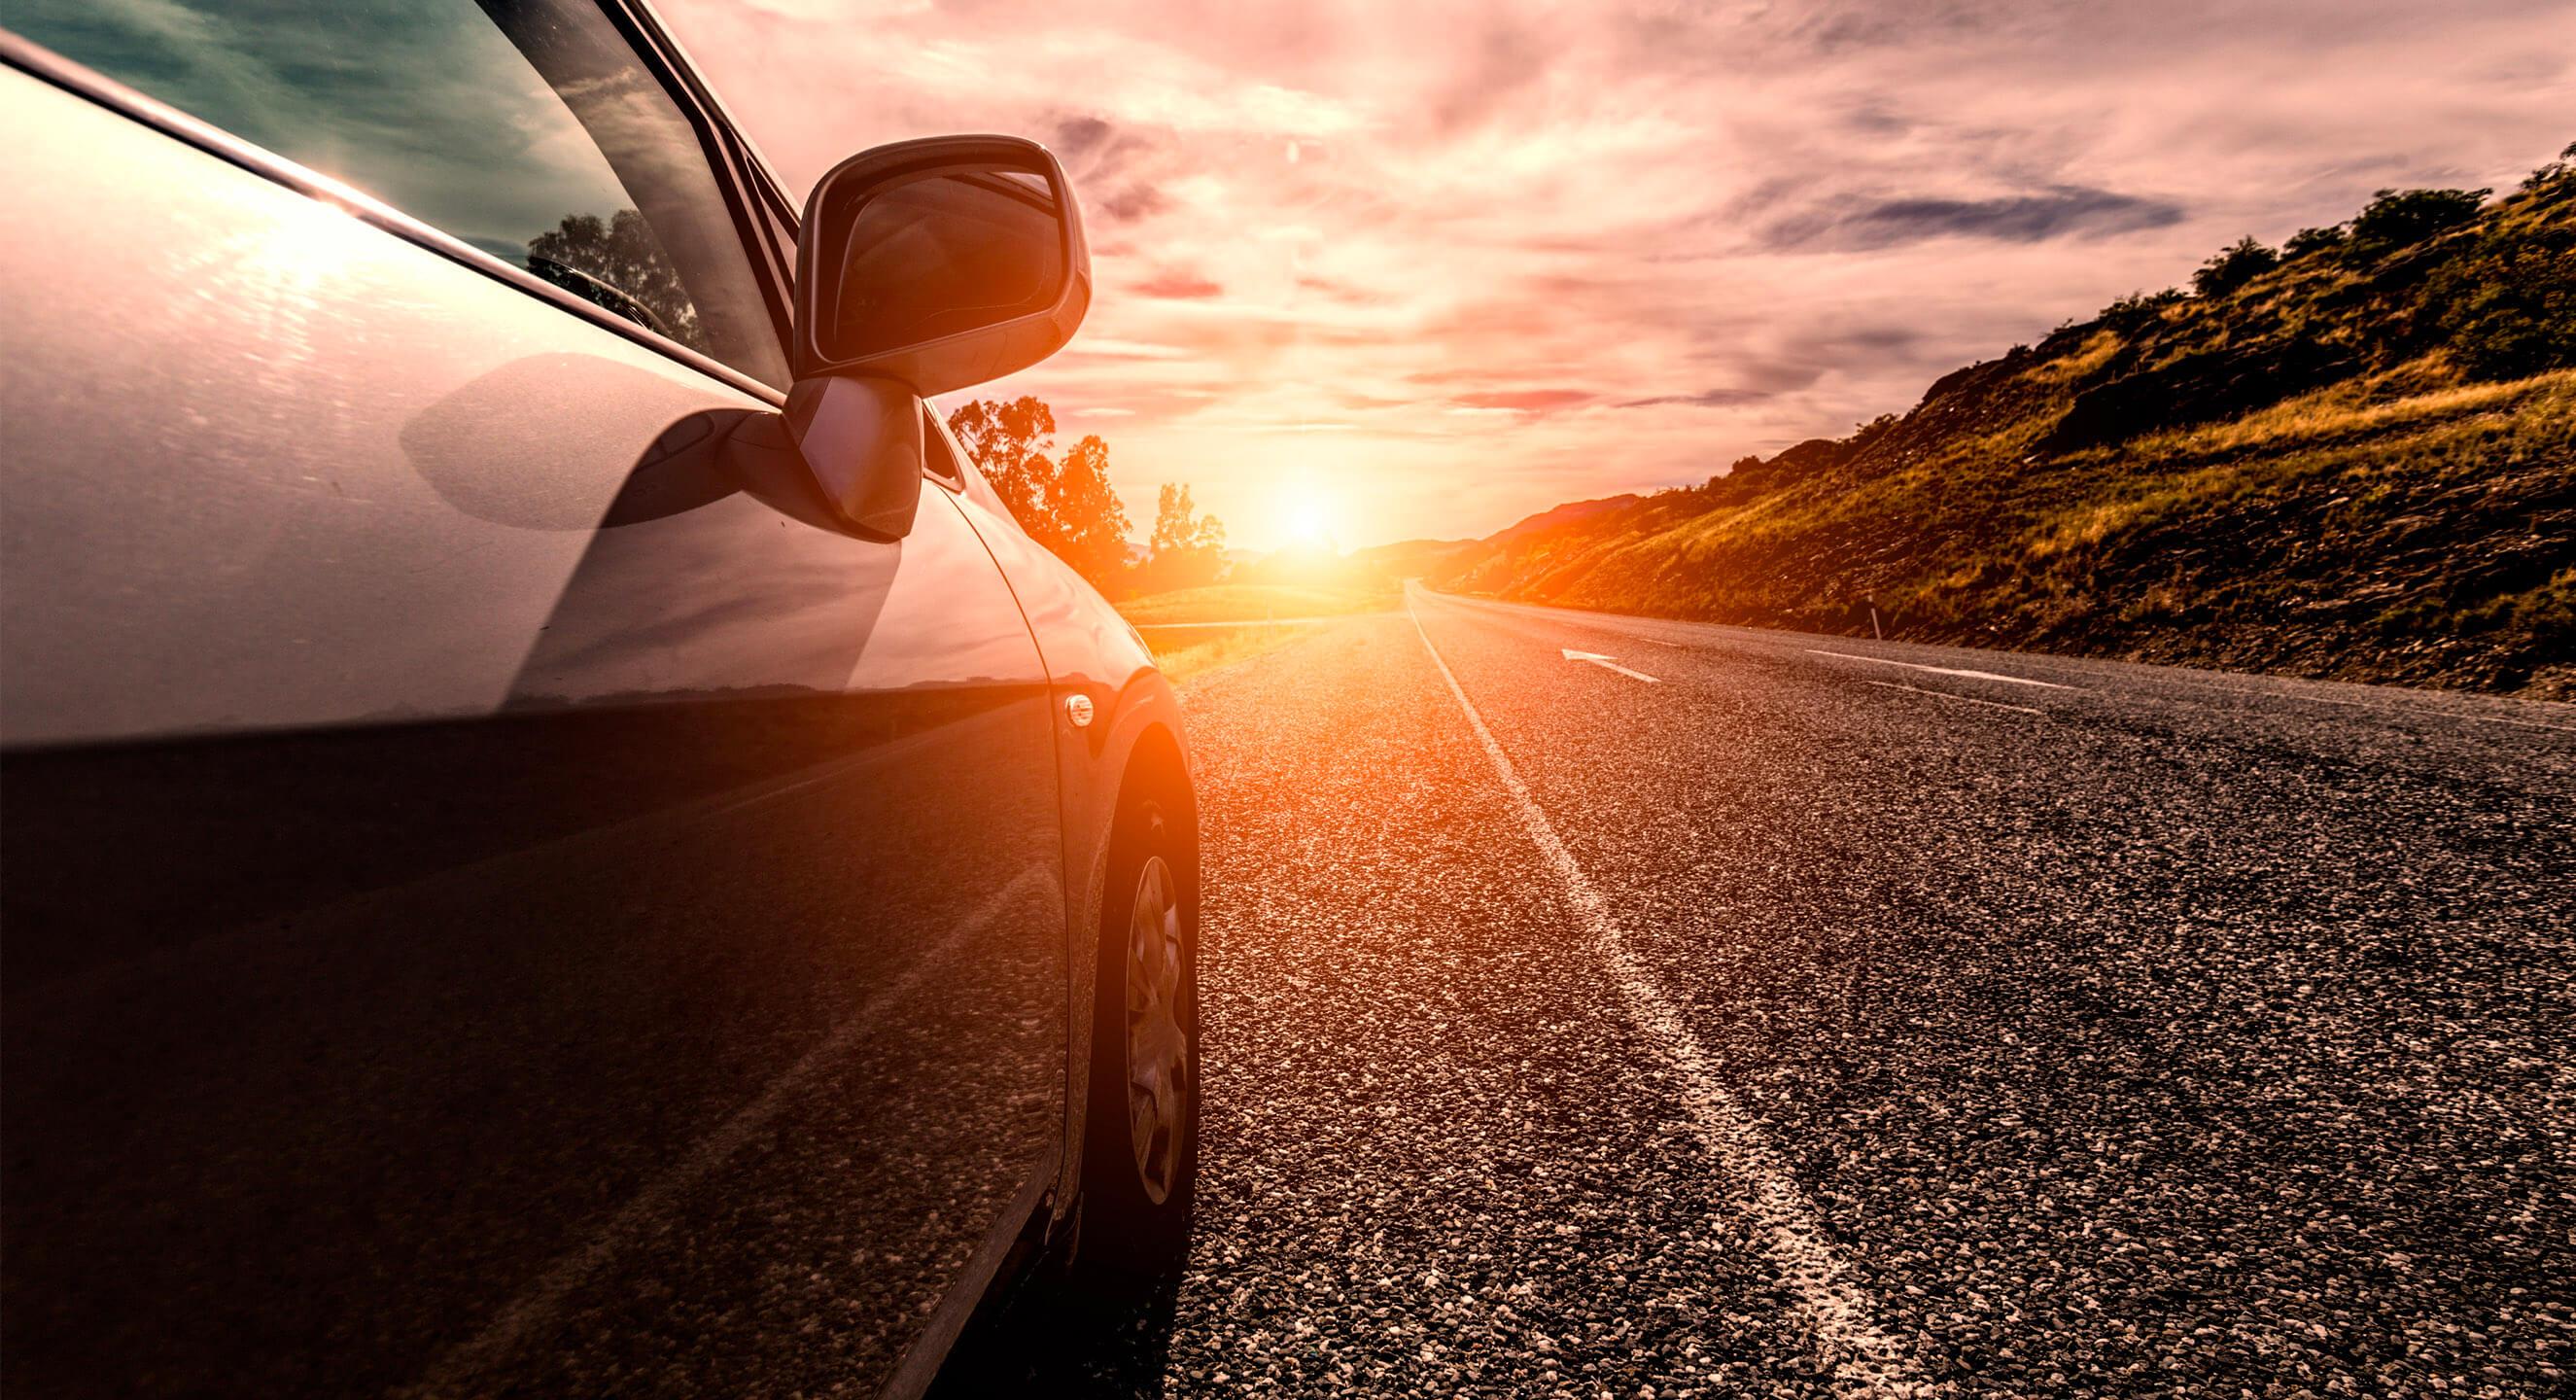 carros usados medellin carro carretera atardecer